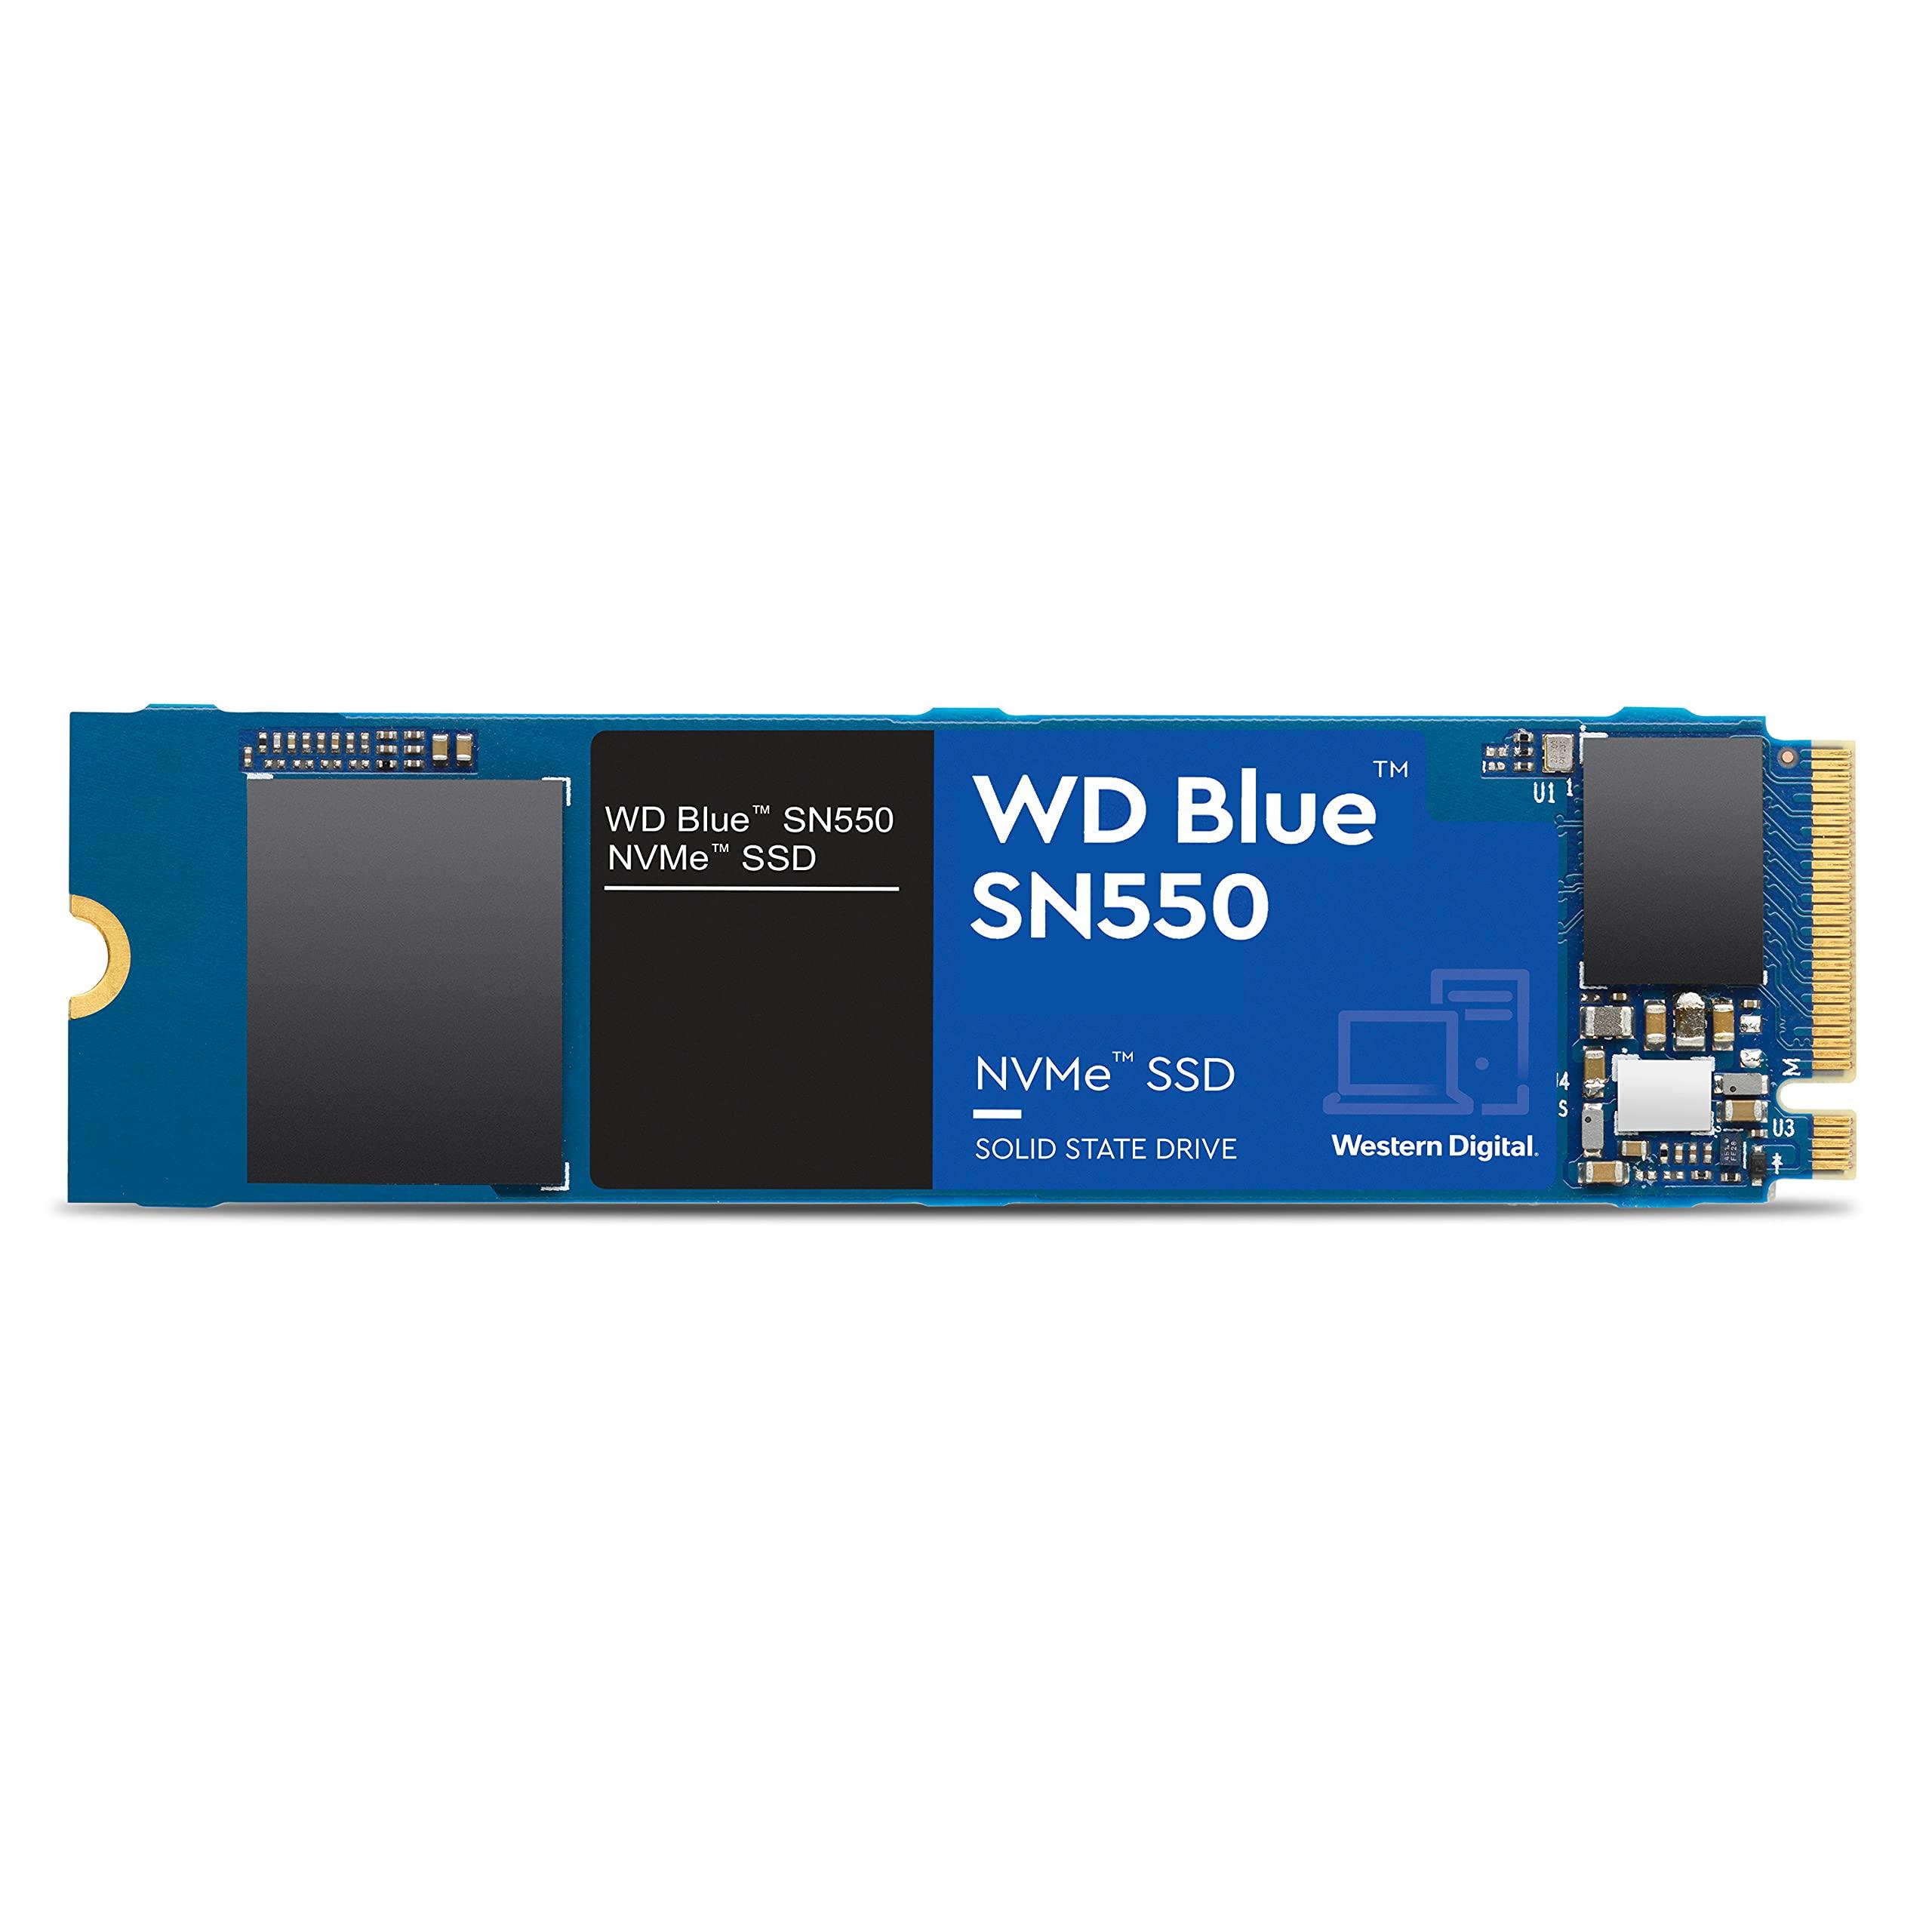 Western Digital 2TB WD Blue SN550 NVMe Internal SSD $199.99